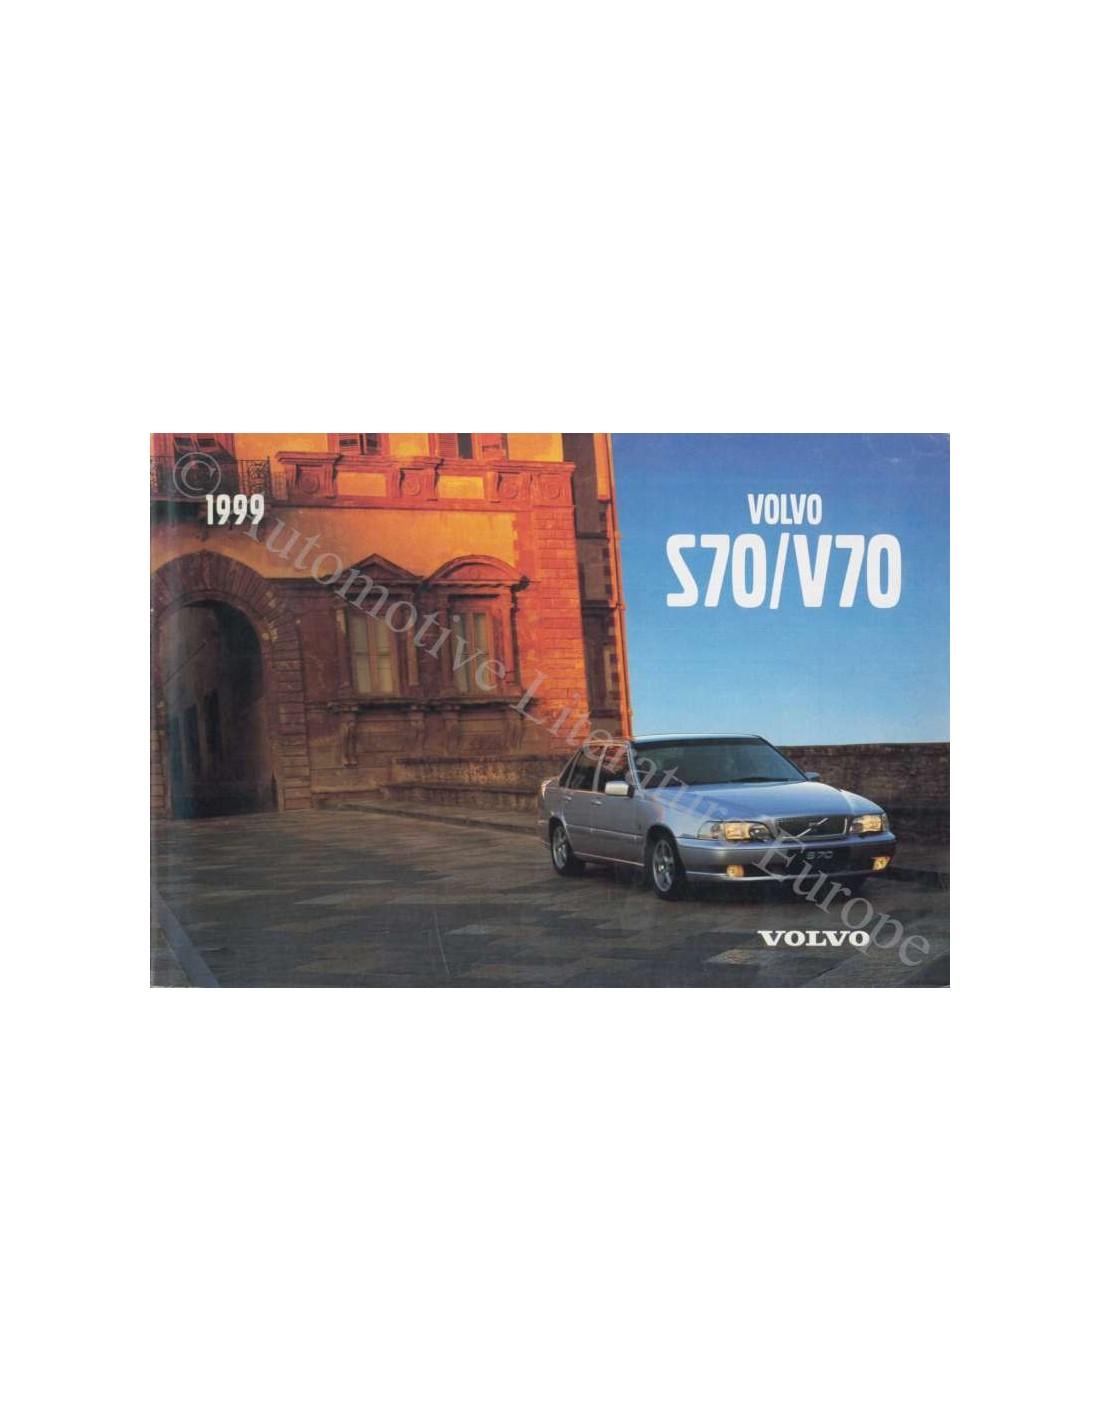 1999 volvo s70 v70 owner s manual english rh autolit eu 1999 Volvo S70 Gas Rail Volvo S70 Repair